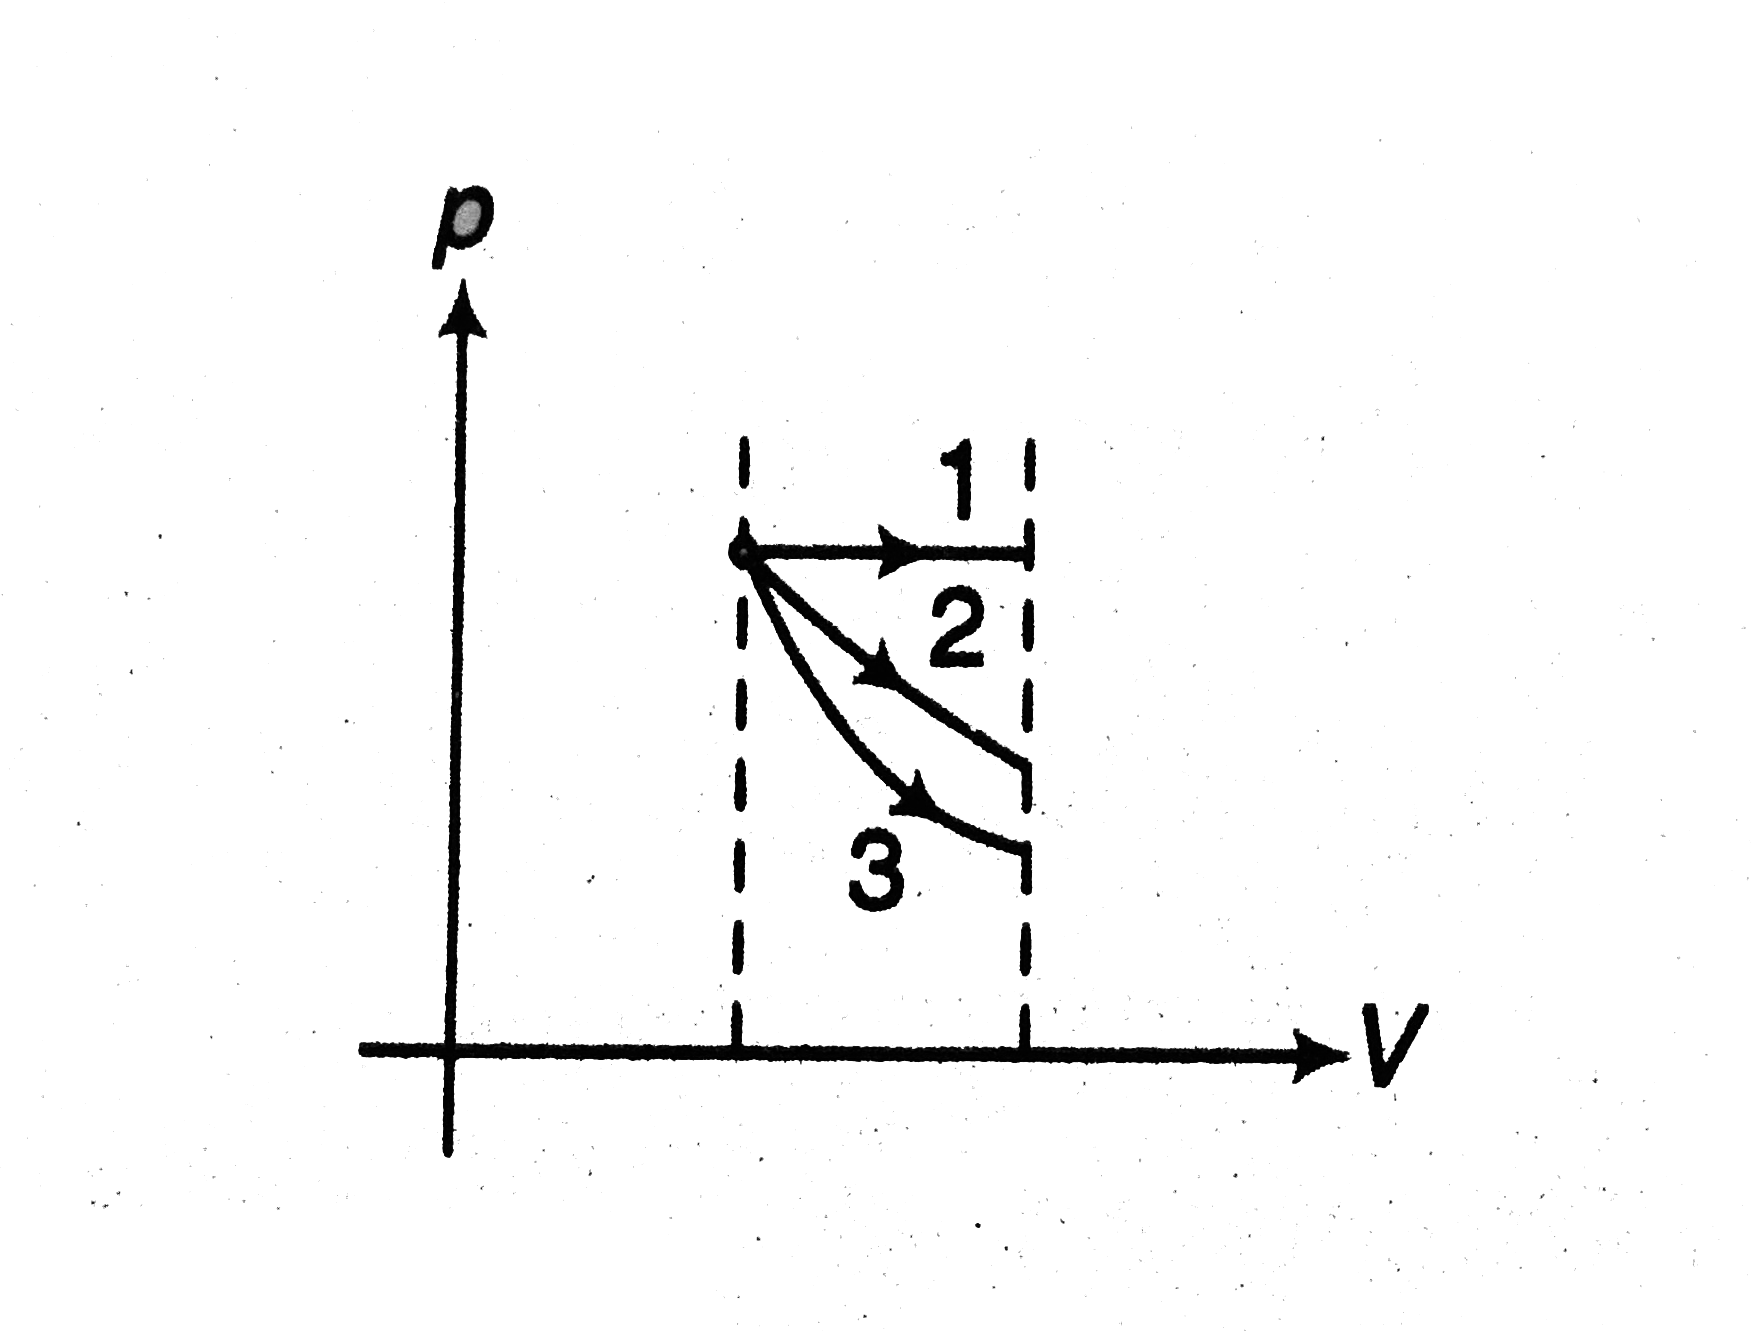 hight resolution of 3 adiabatic minimum area is under graph 3